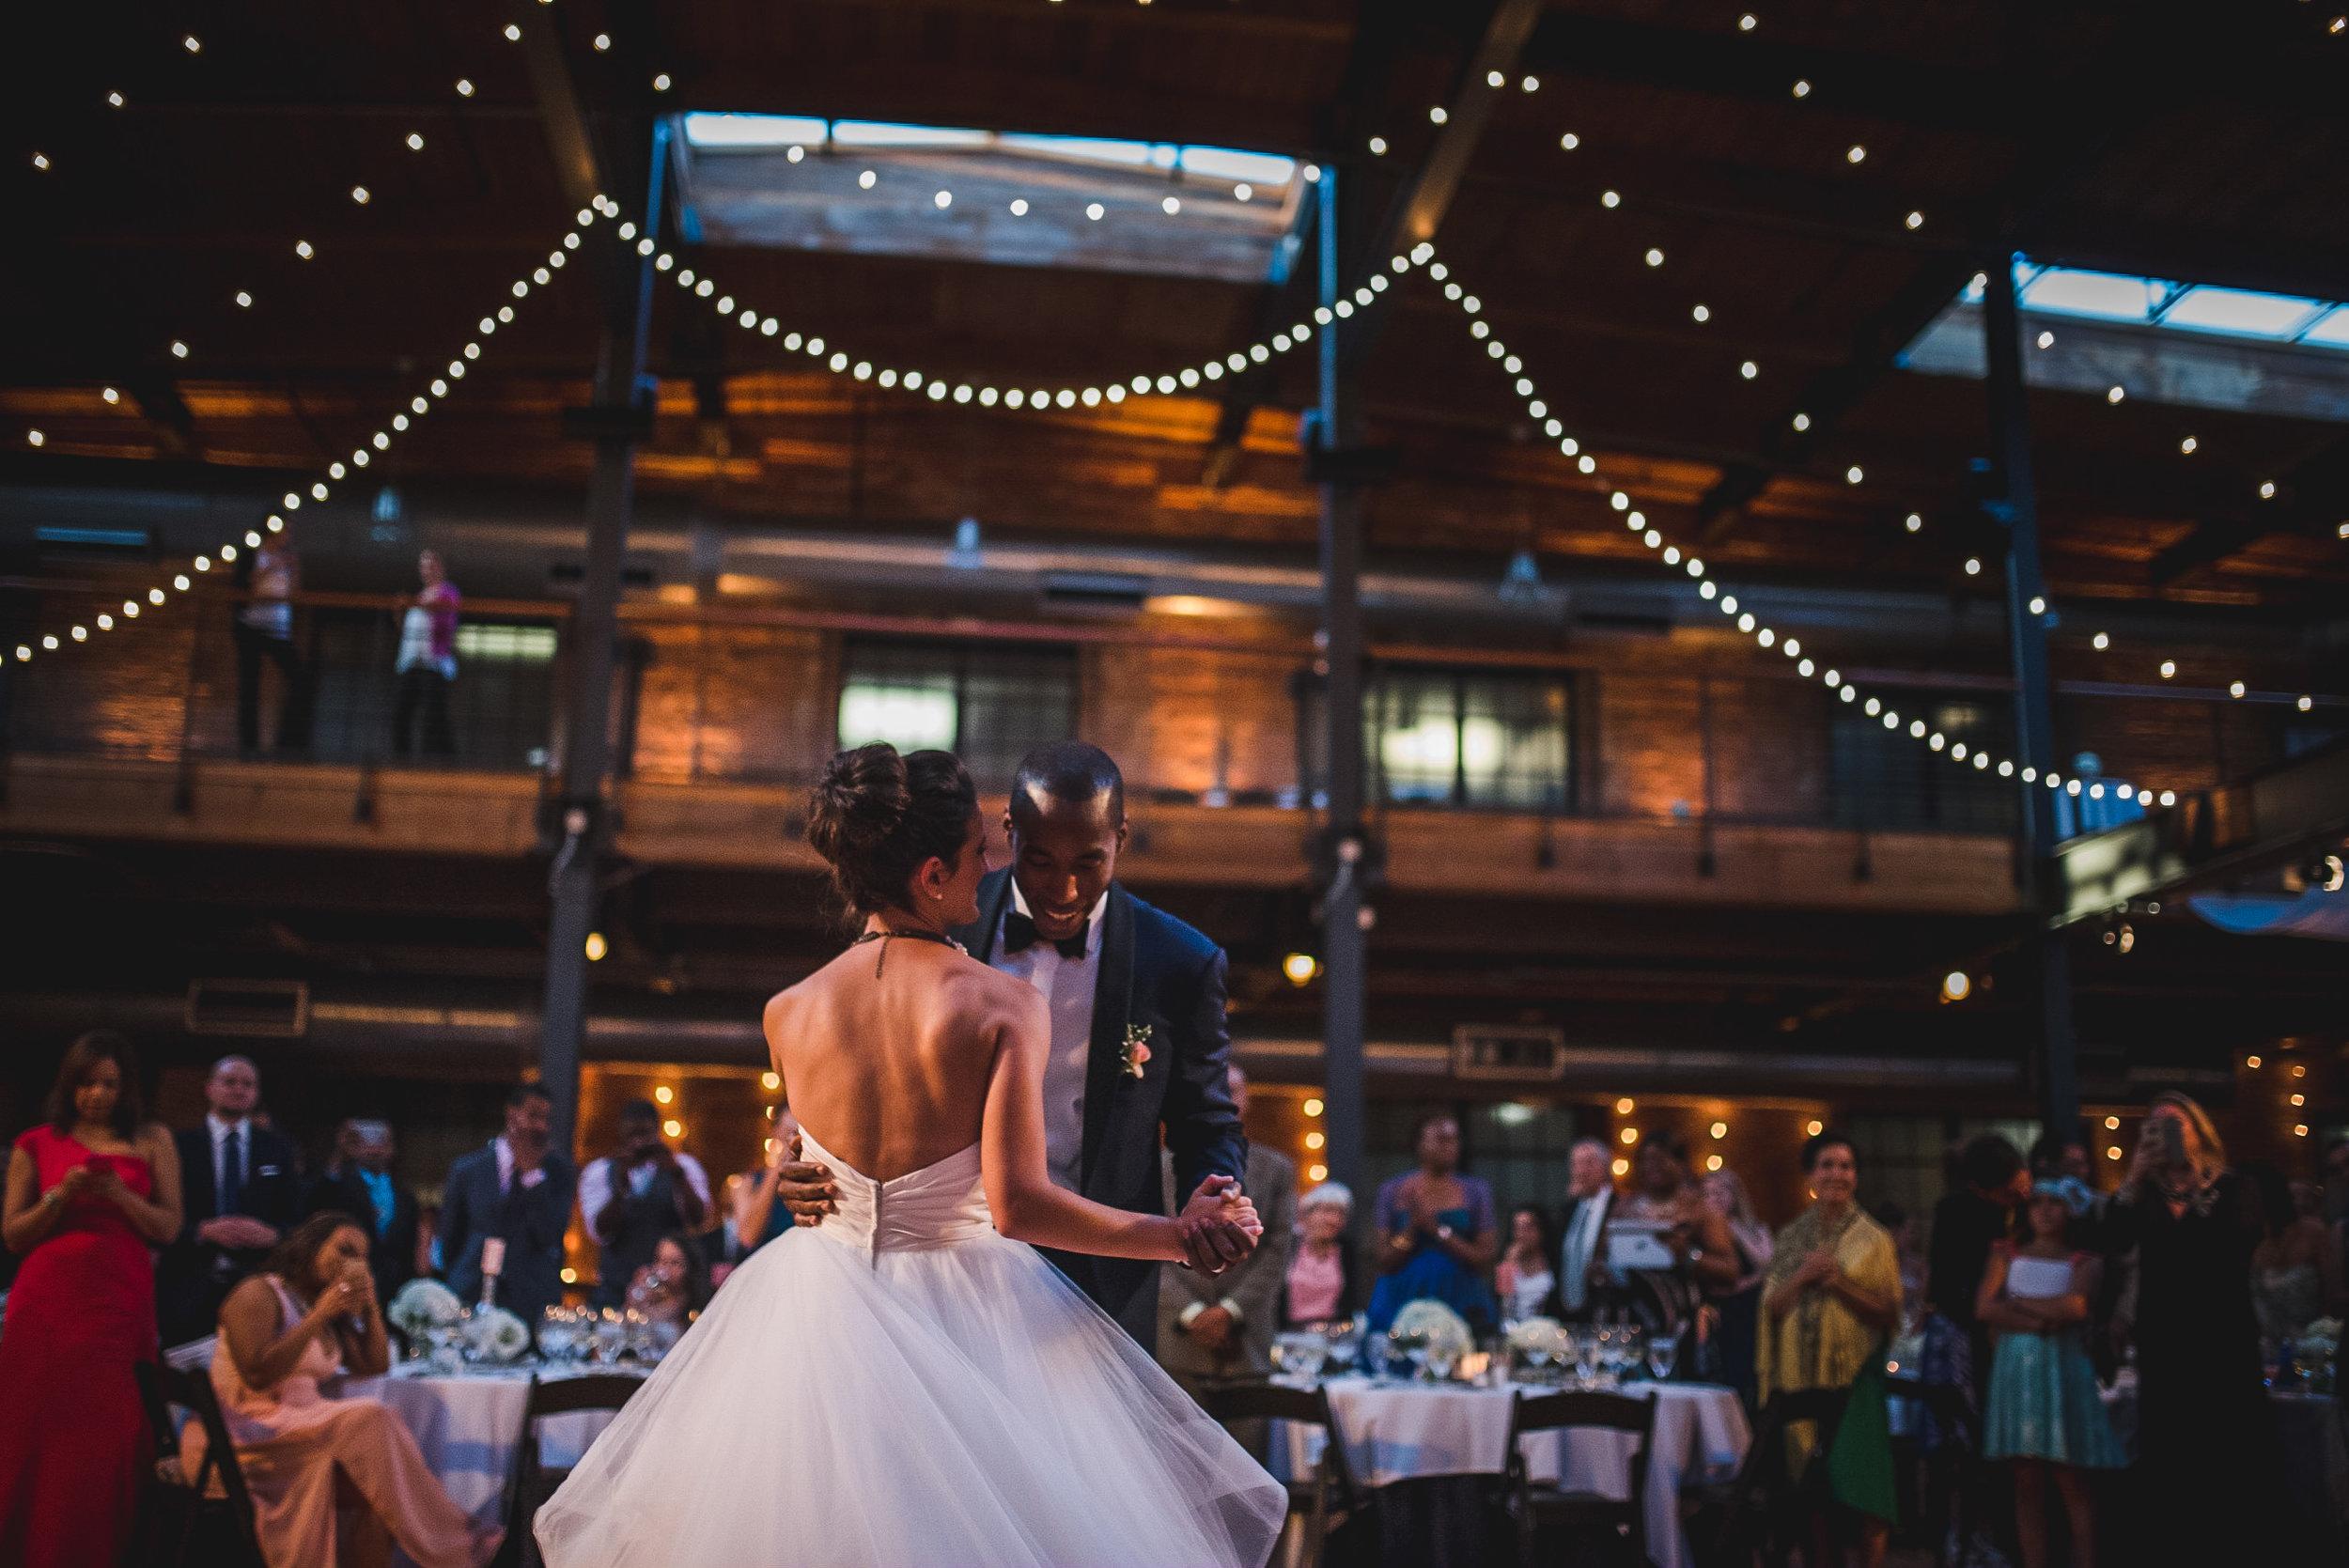 21c Museum Hotel Durham North Carolina Wedding-29.jpg